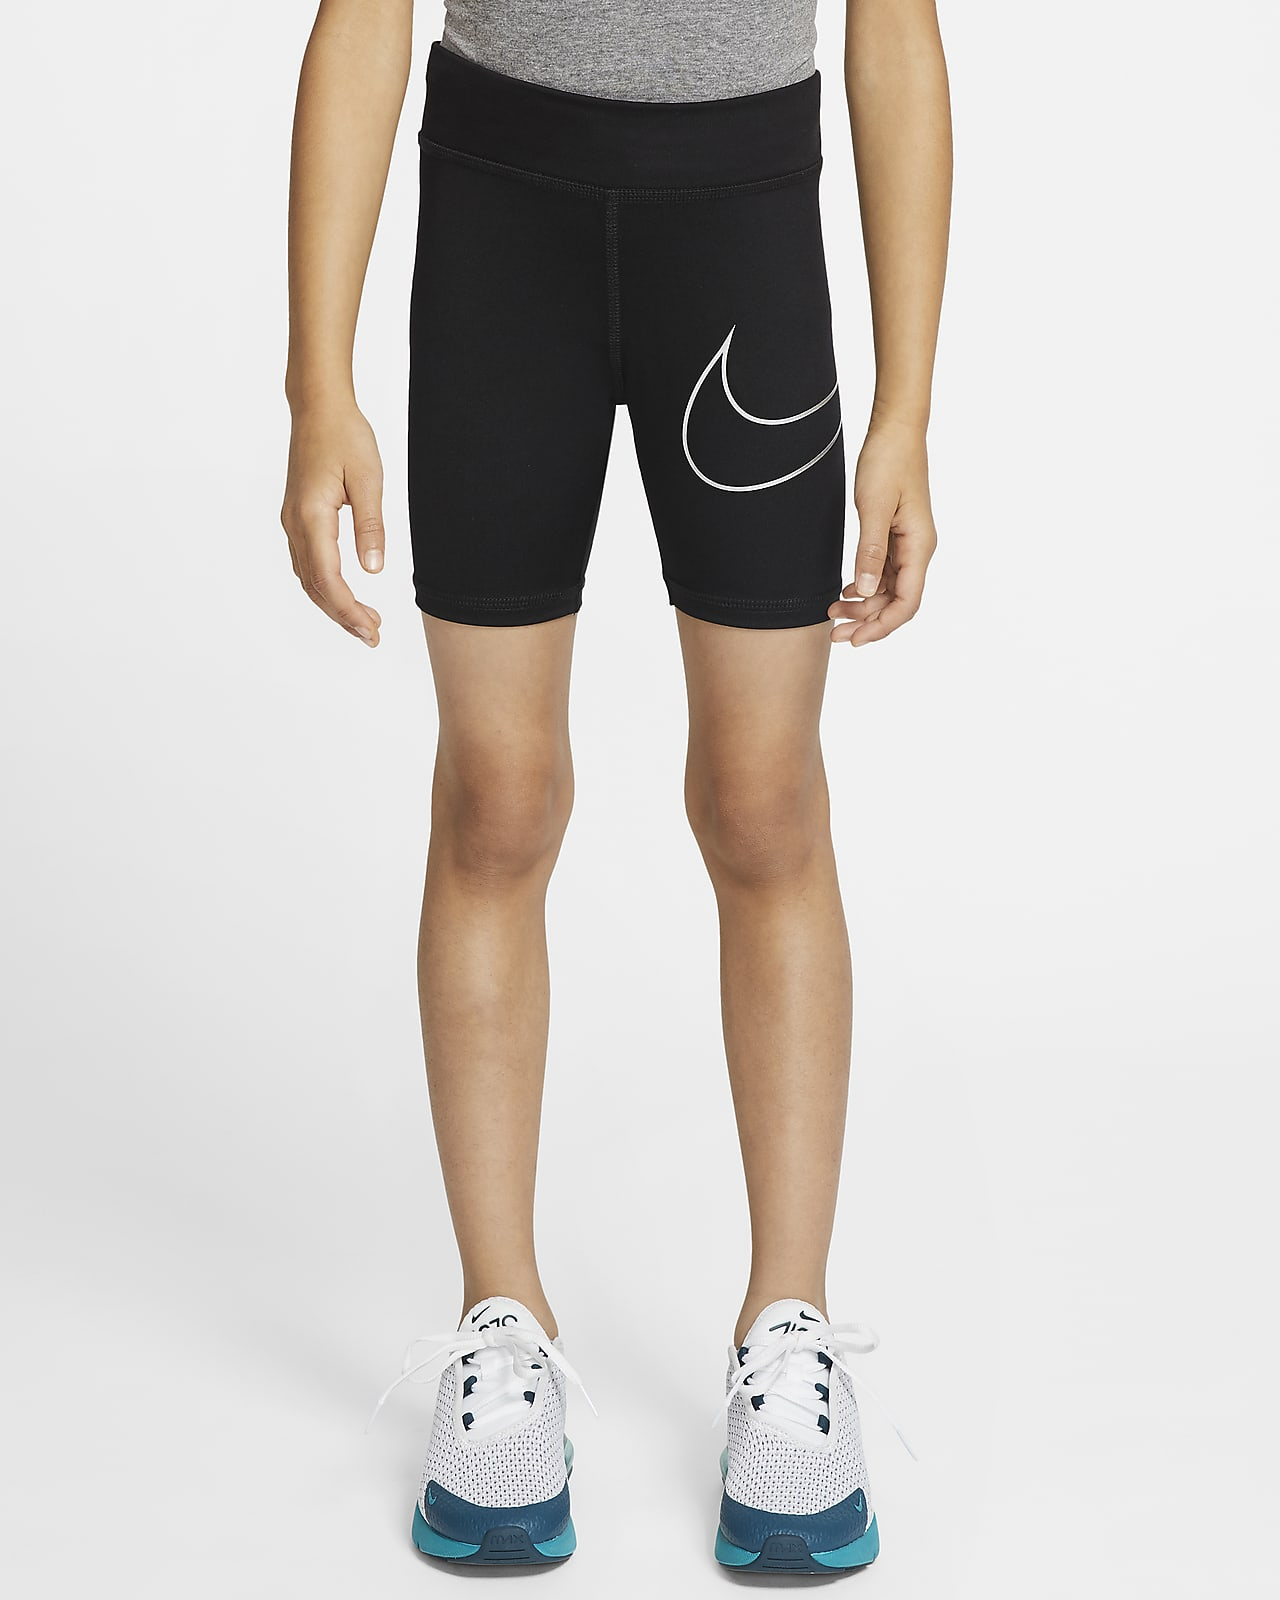 Nike Dri-FIT Little Kids' Shorts